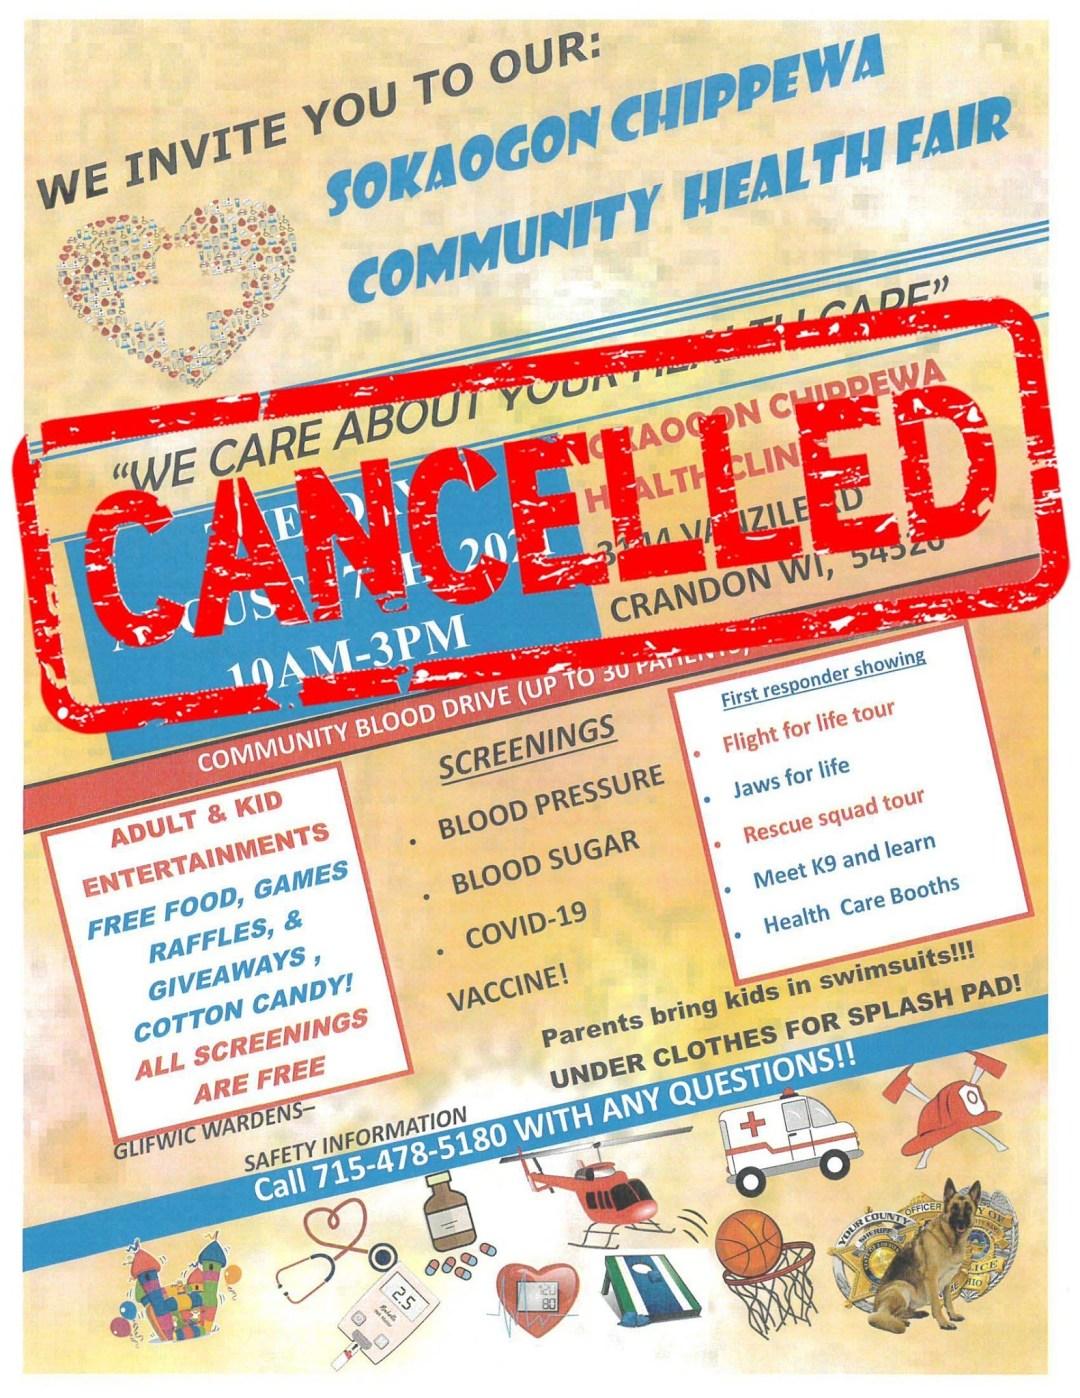 The Sokaogon Chippewa Community Health Fair Has Been Cancelled